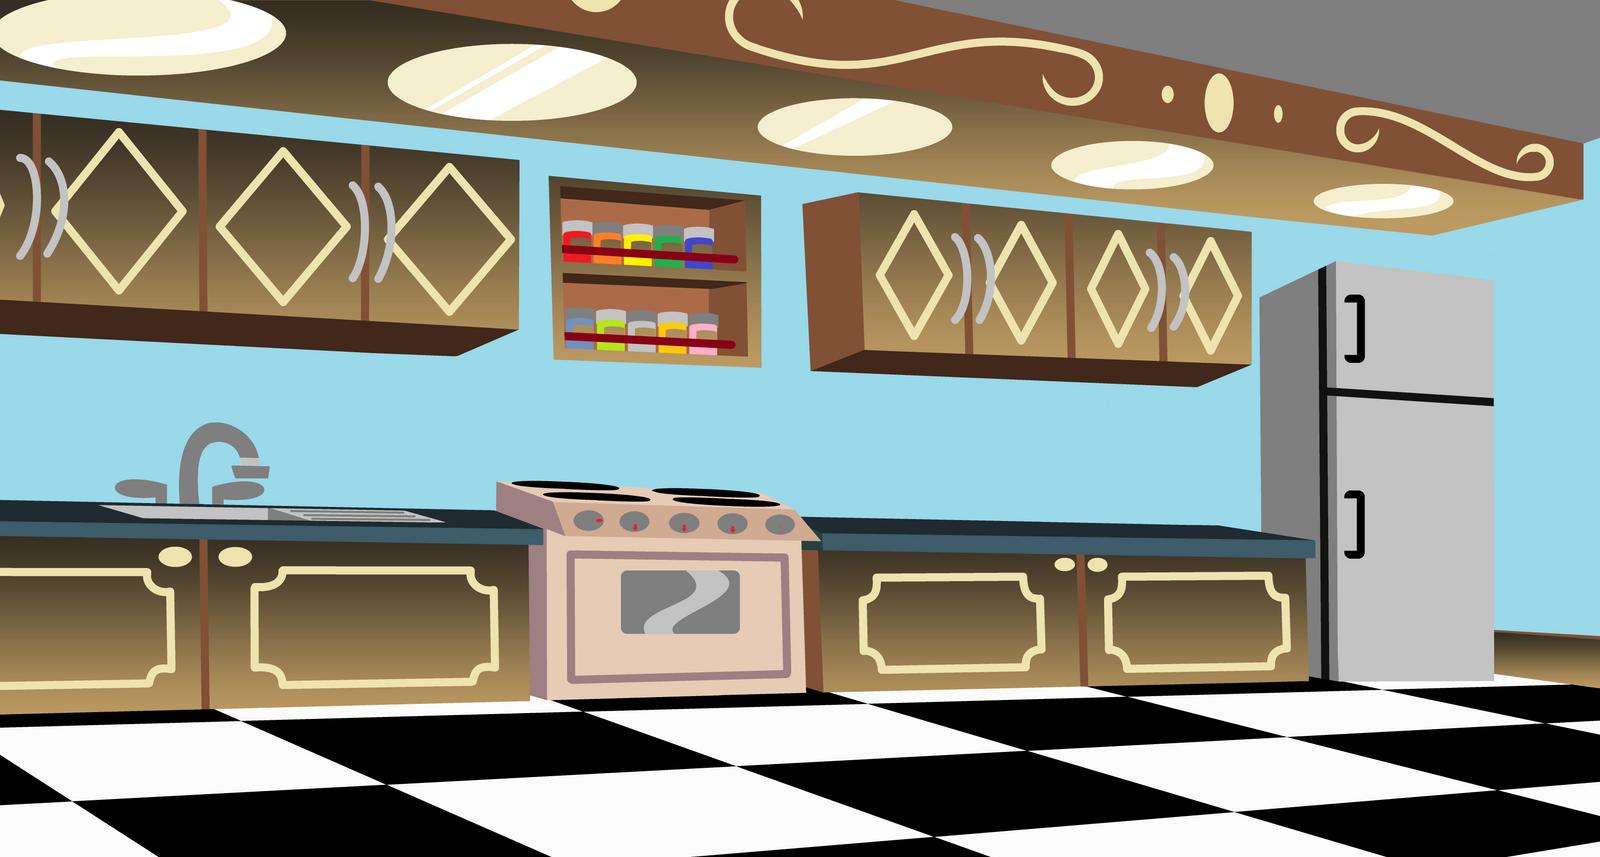 frenzys parents Kitchen background by EvilFrenzy on DeviantArt